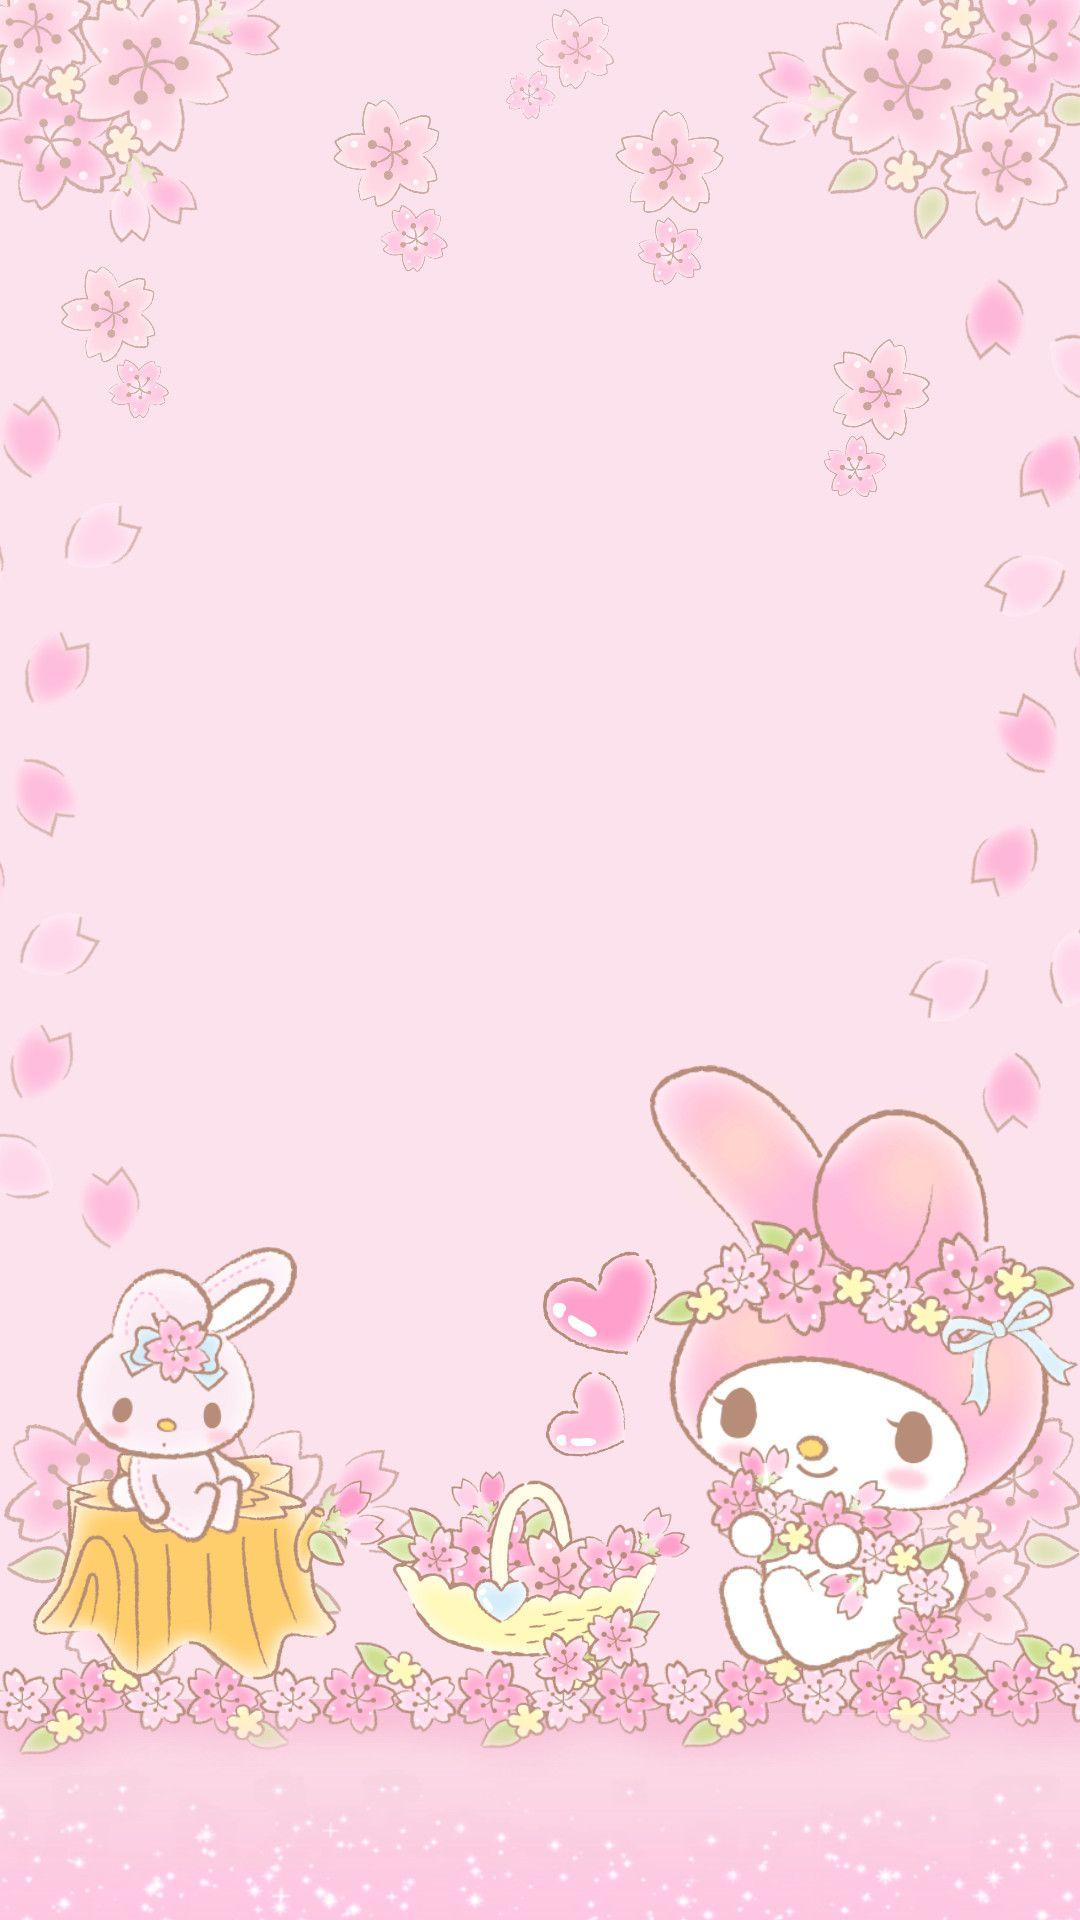 1080x1920 Heymi243 My Melody Hello Kitty Wallpapers My Melody